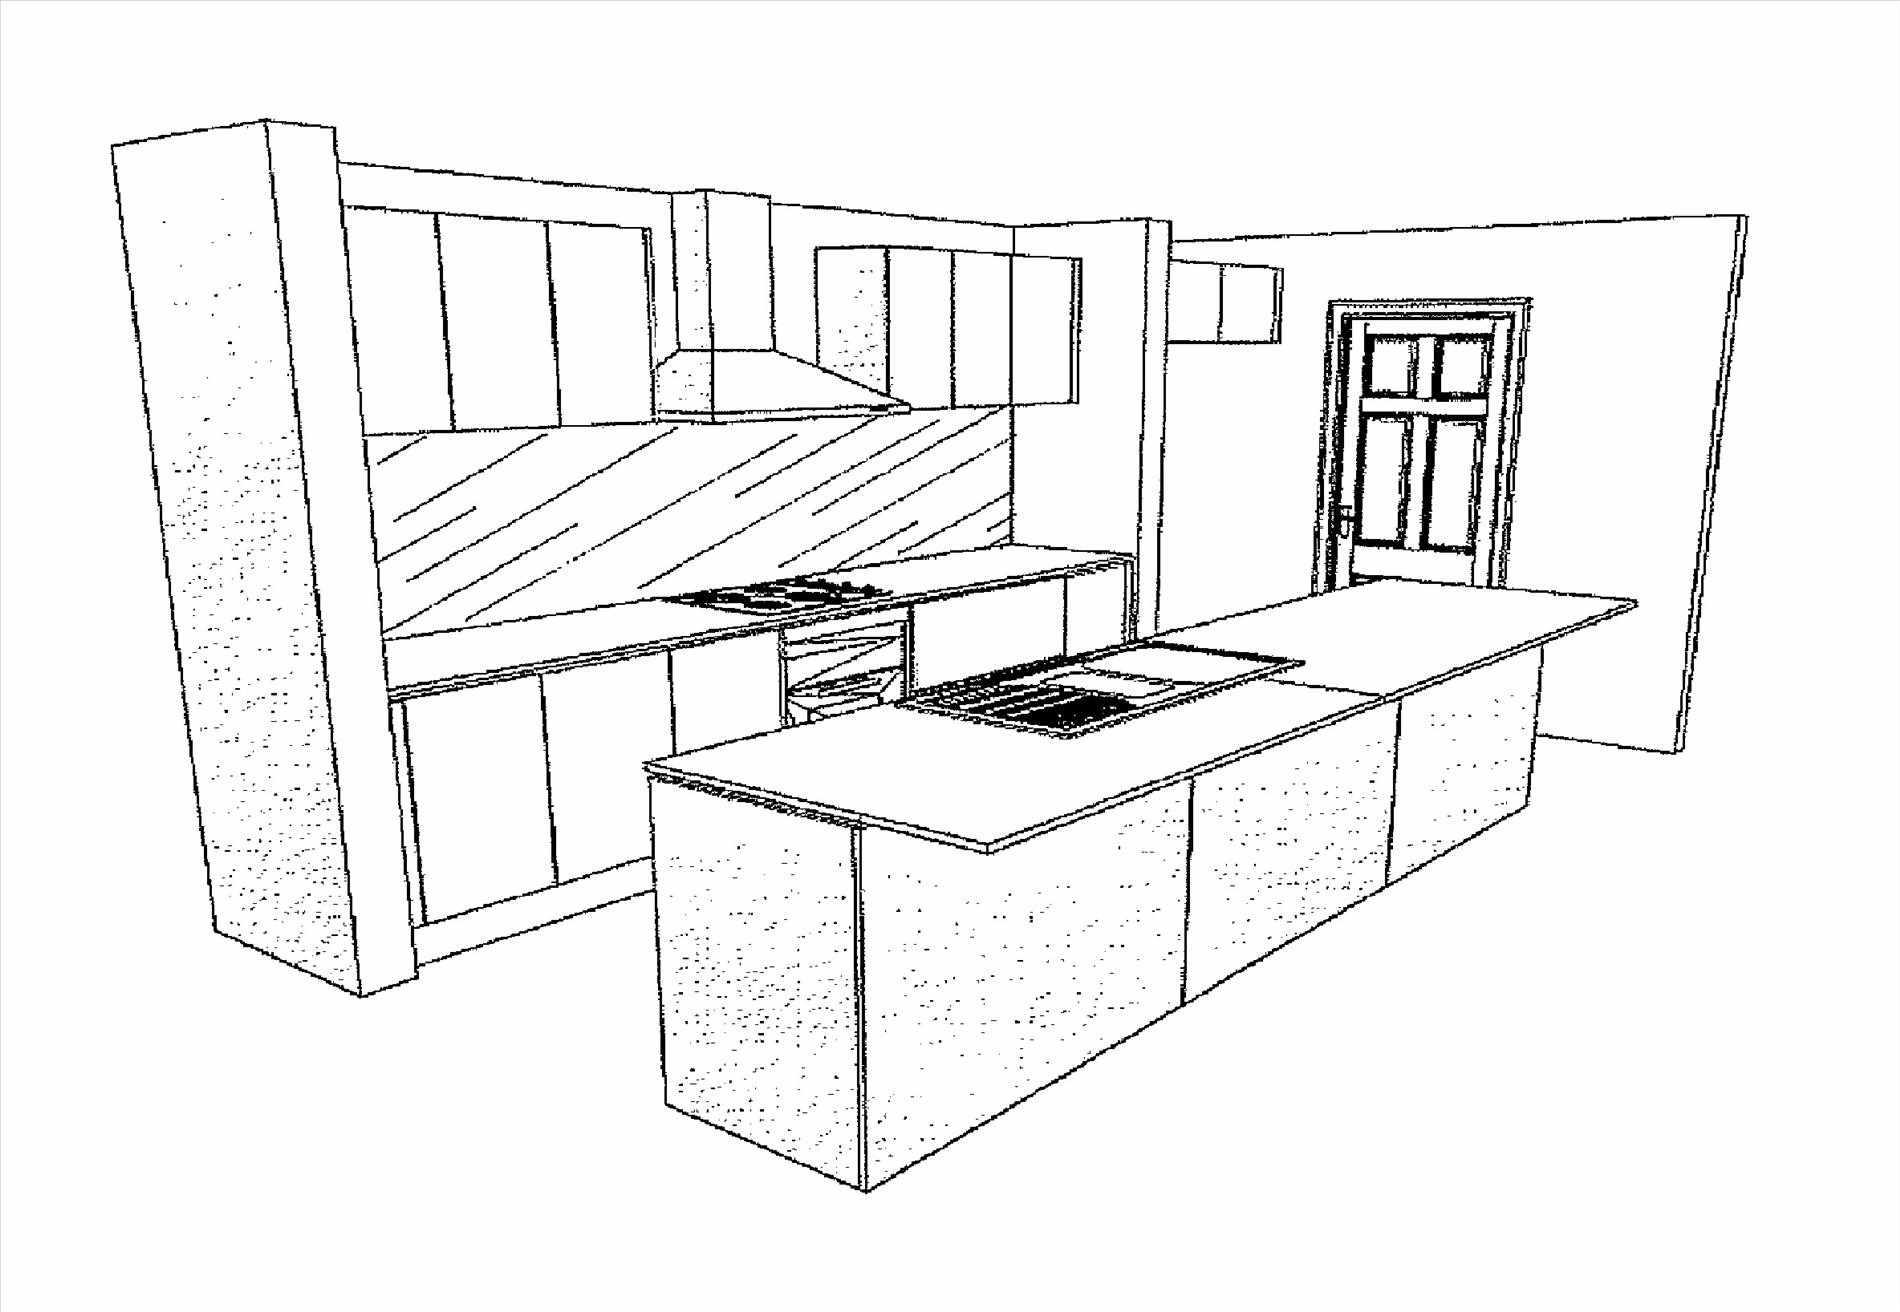 kitchen design drawing at getdrawings com